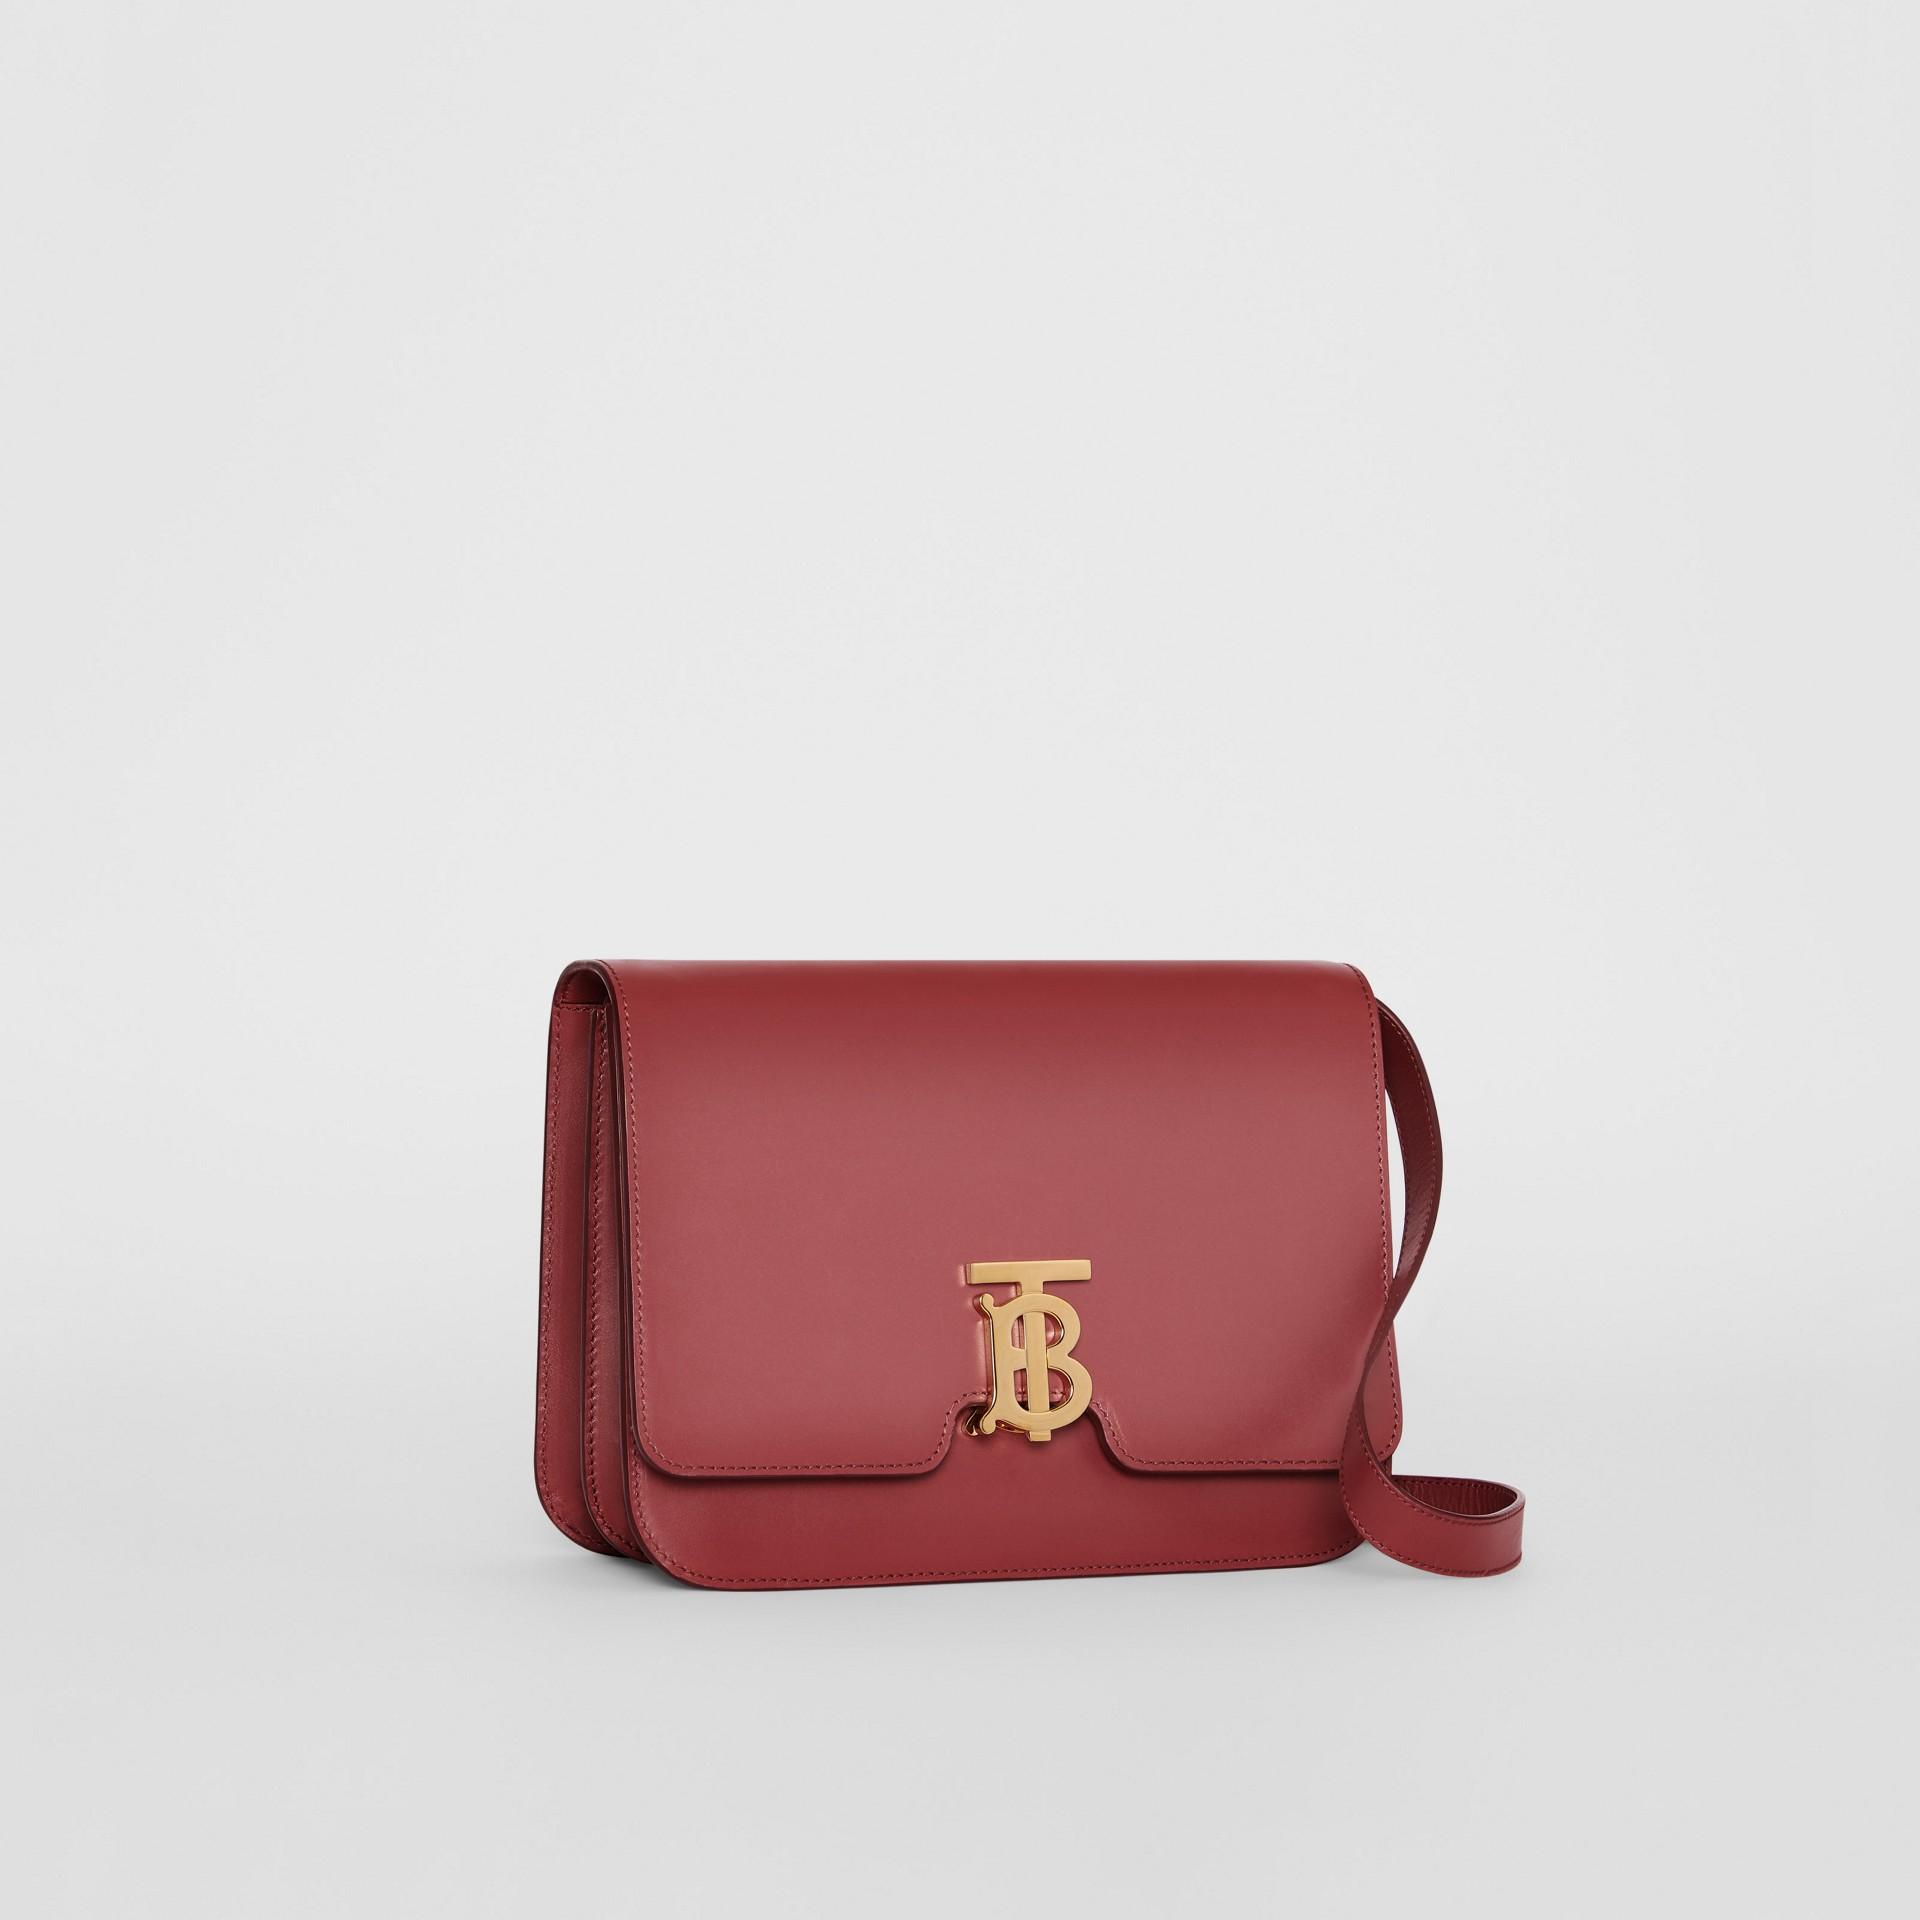 Medium Leather TB Bag in Crimson - Women   Burberry United States - gallery image 6